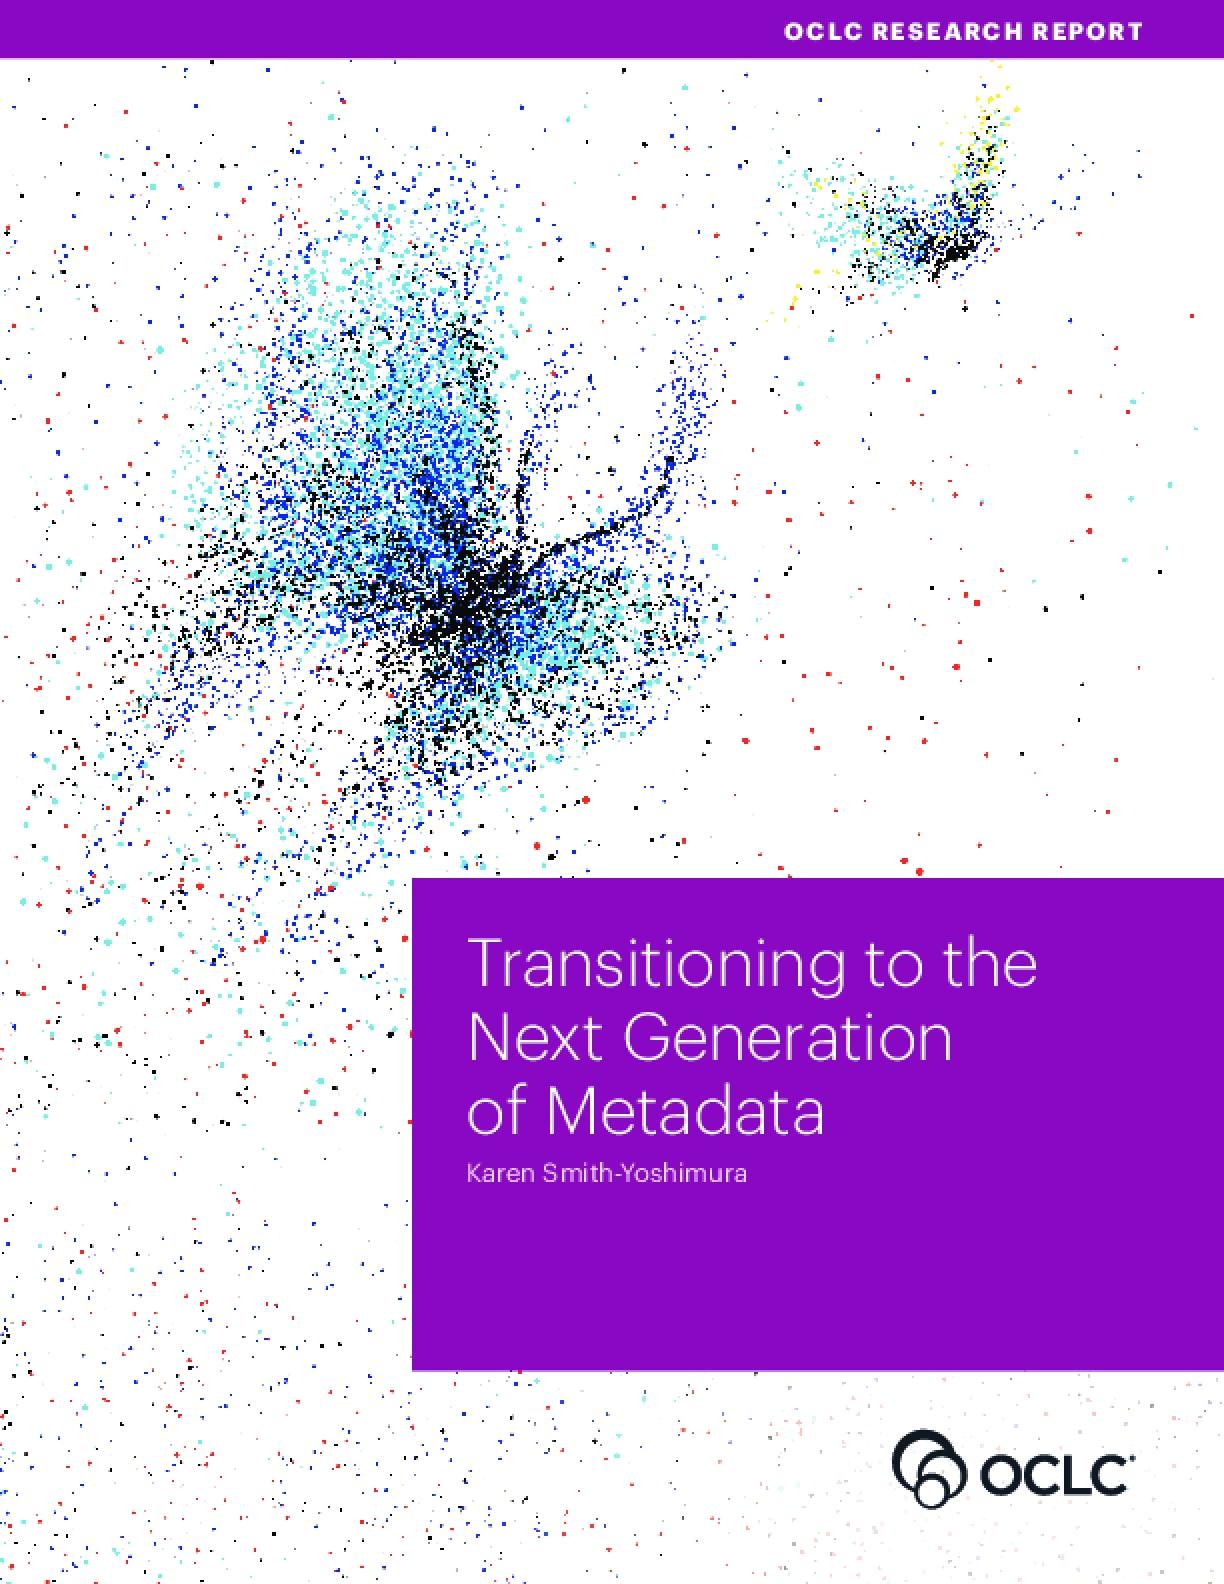 Transitioning to the Next Generation of Metadata